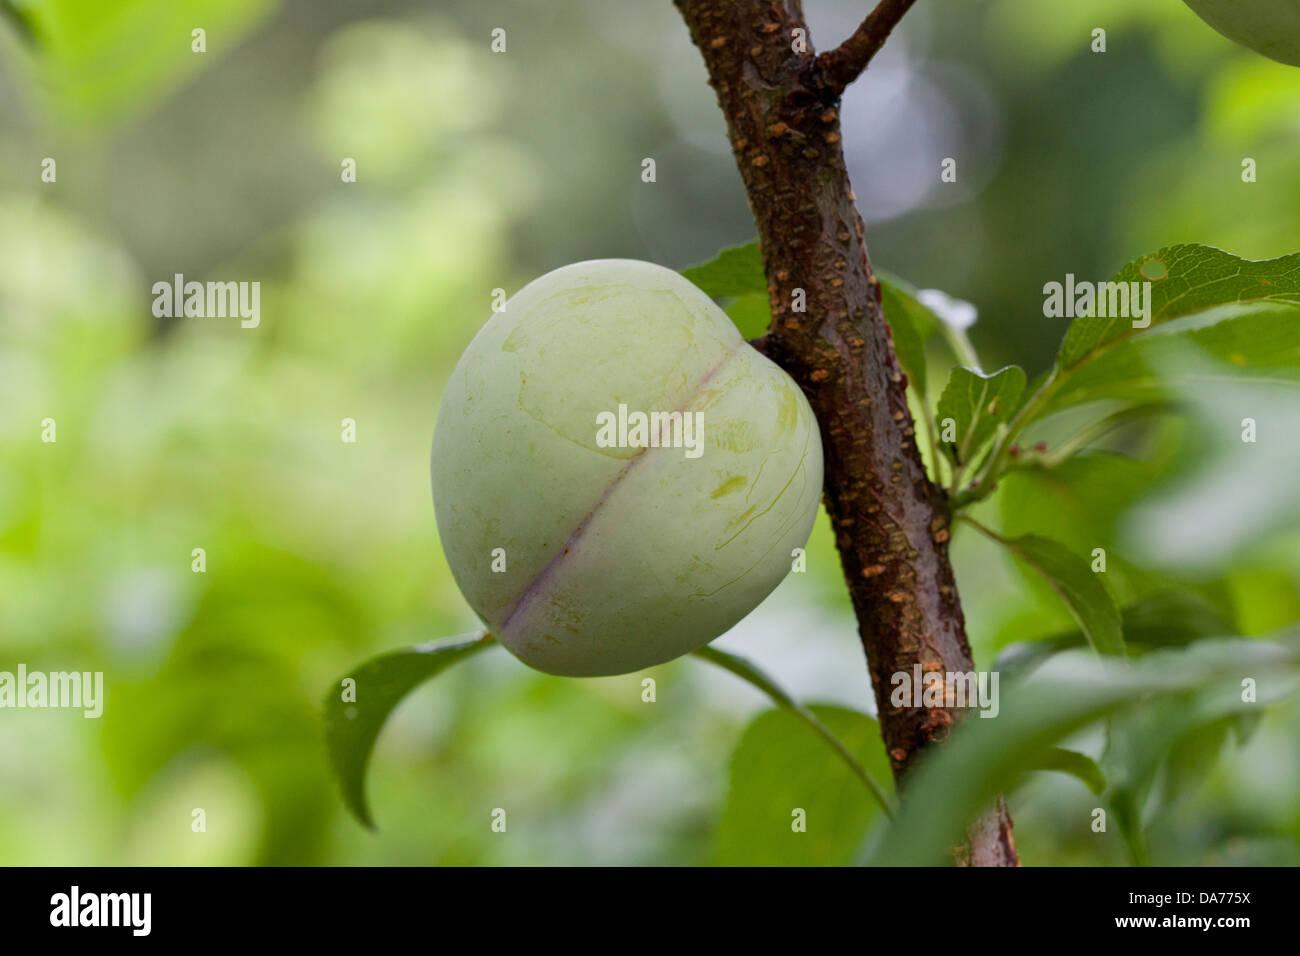 Japanische Pflaume auf Ast (Prunus Salicina) Stockbild